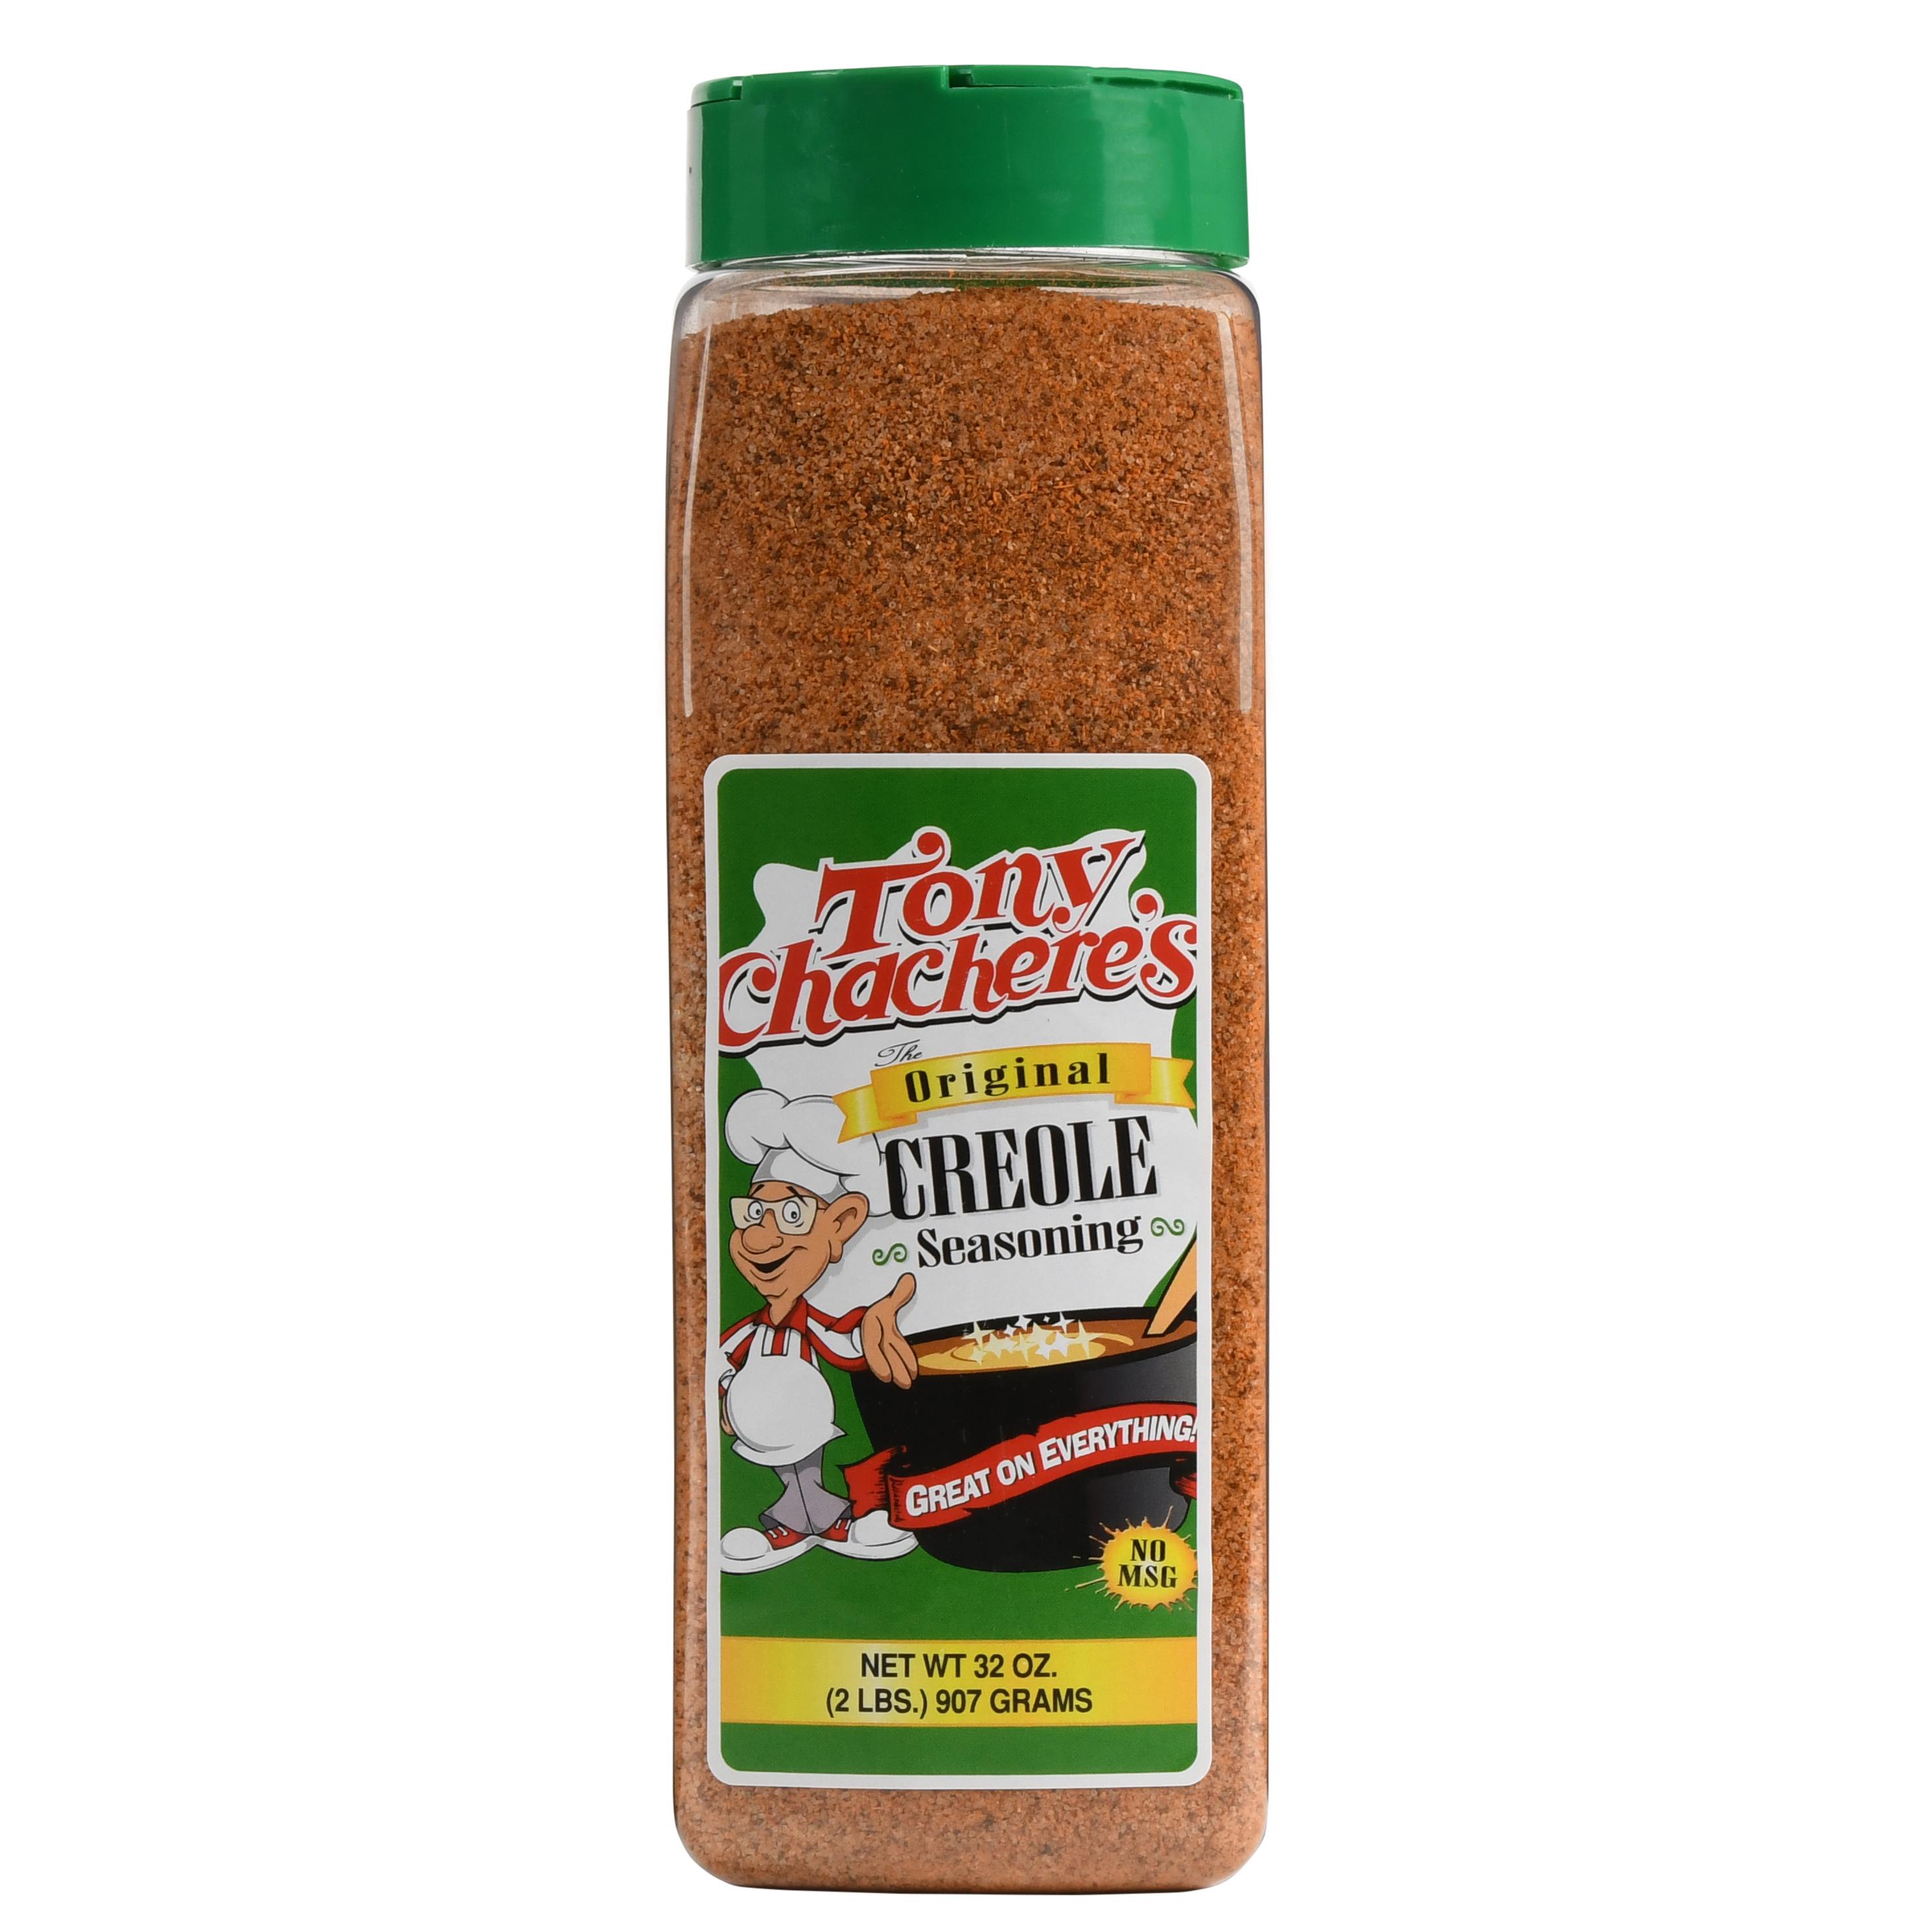 Tony Chachere's Original Creole Seasoning, 32.0 OZ